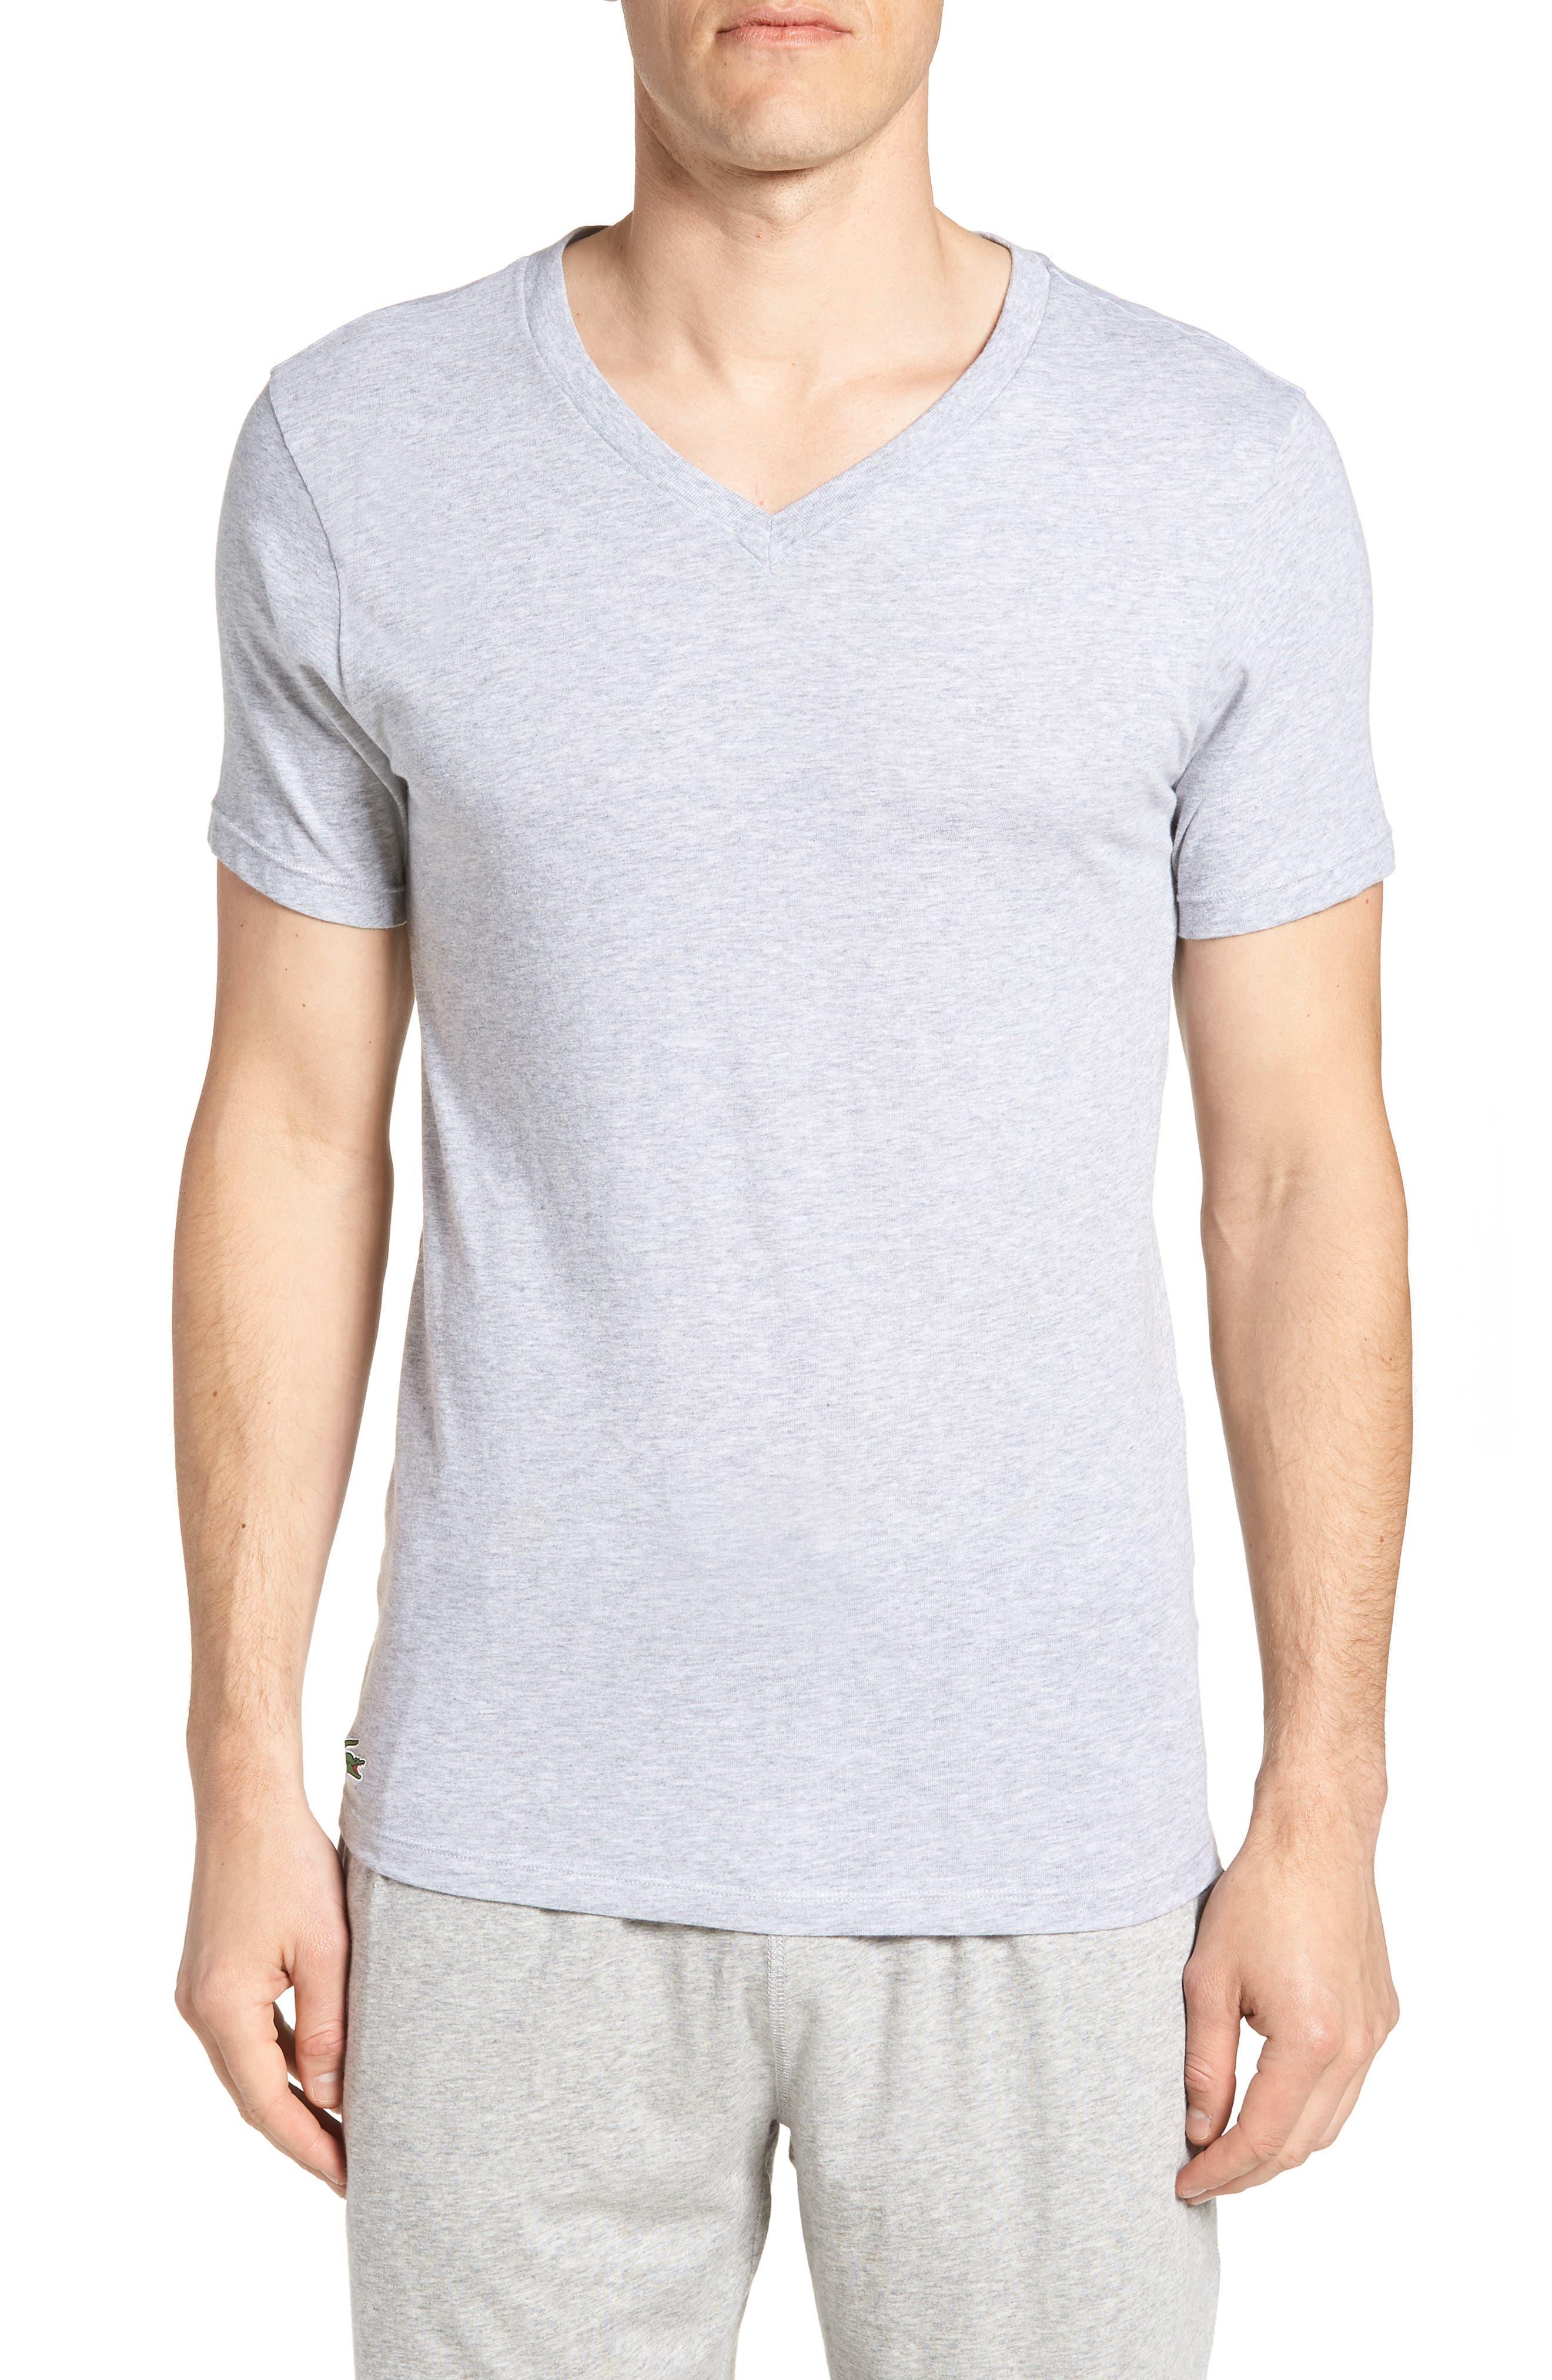 LACOSTE,                             3-Pack Slim Fit V-Neck T-Shirts,                             Main thumbnail 1, color,                             BLACK/ GREY/ WHITE